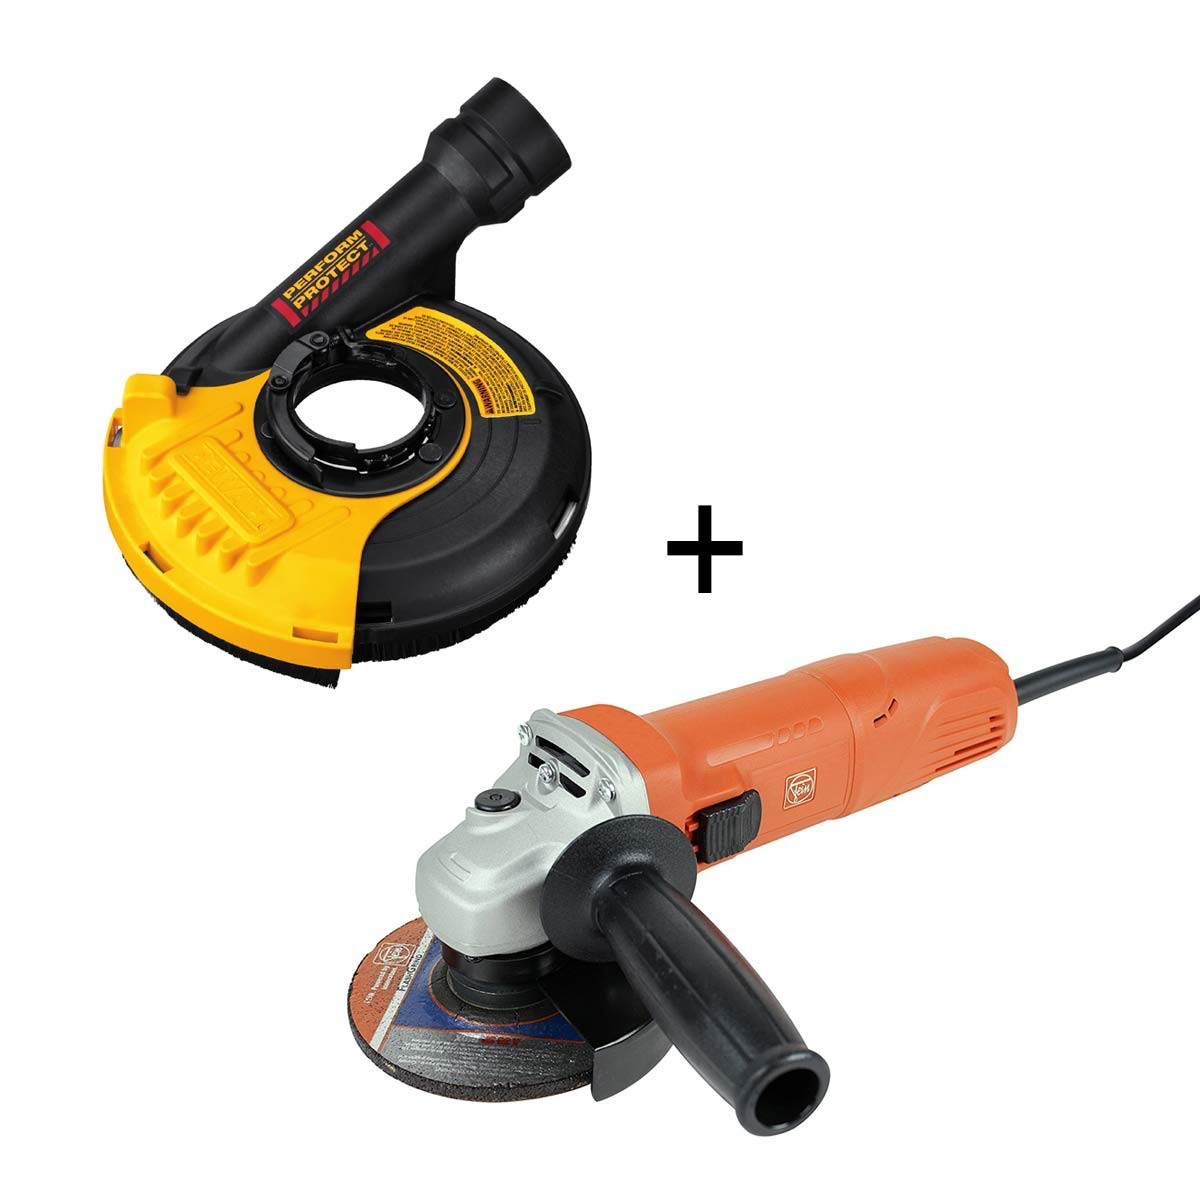 Fein angle grinder optical smoke detector